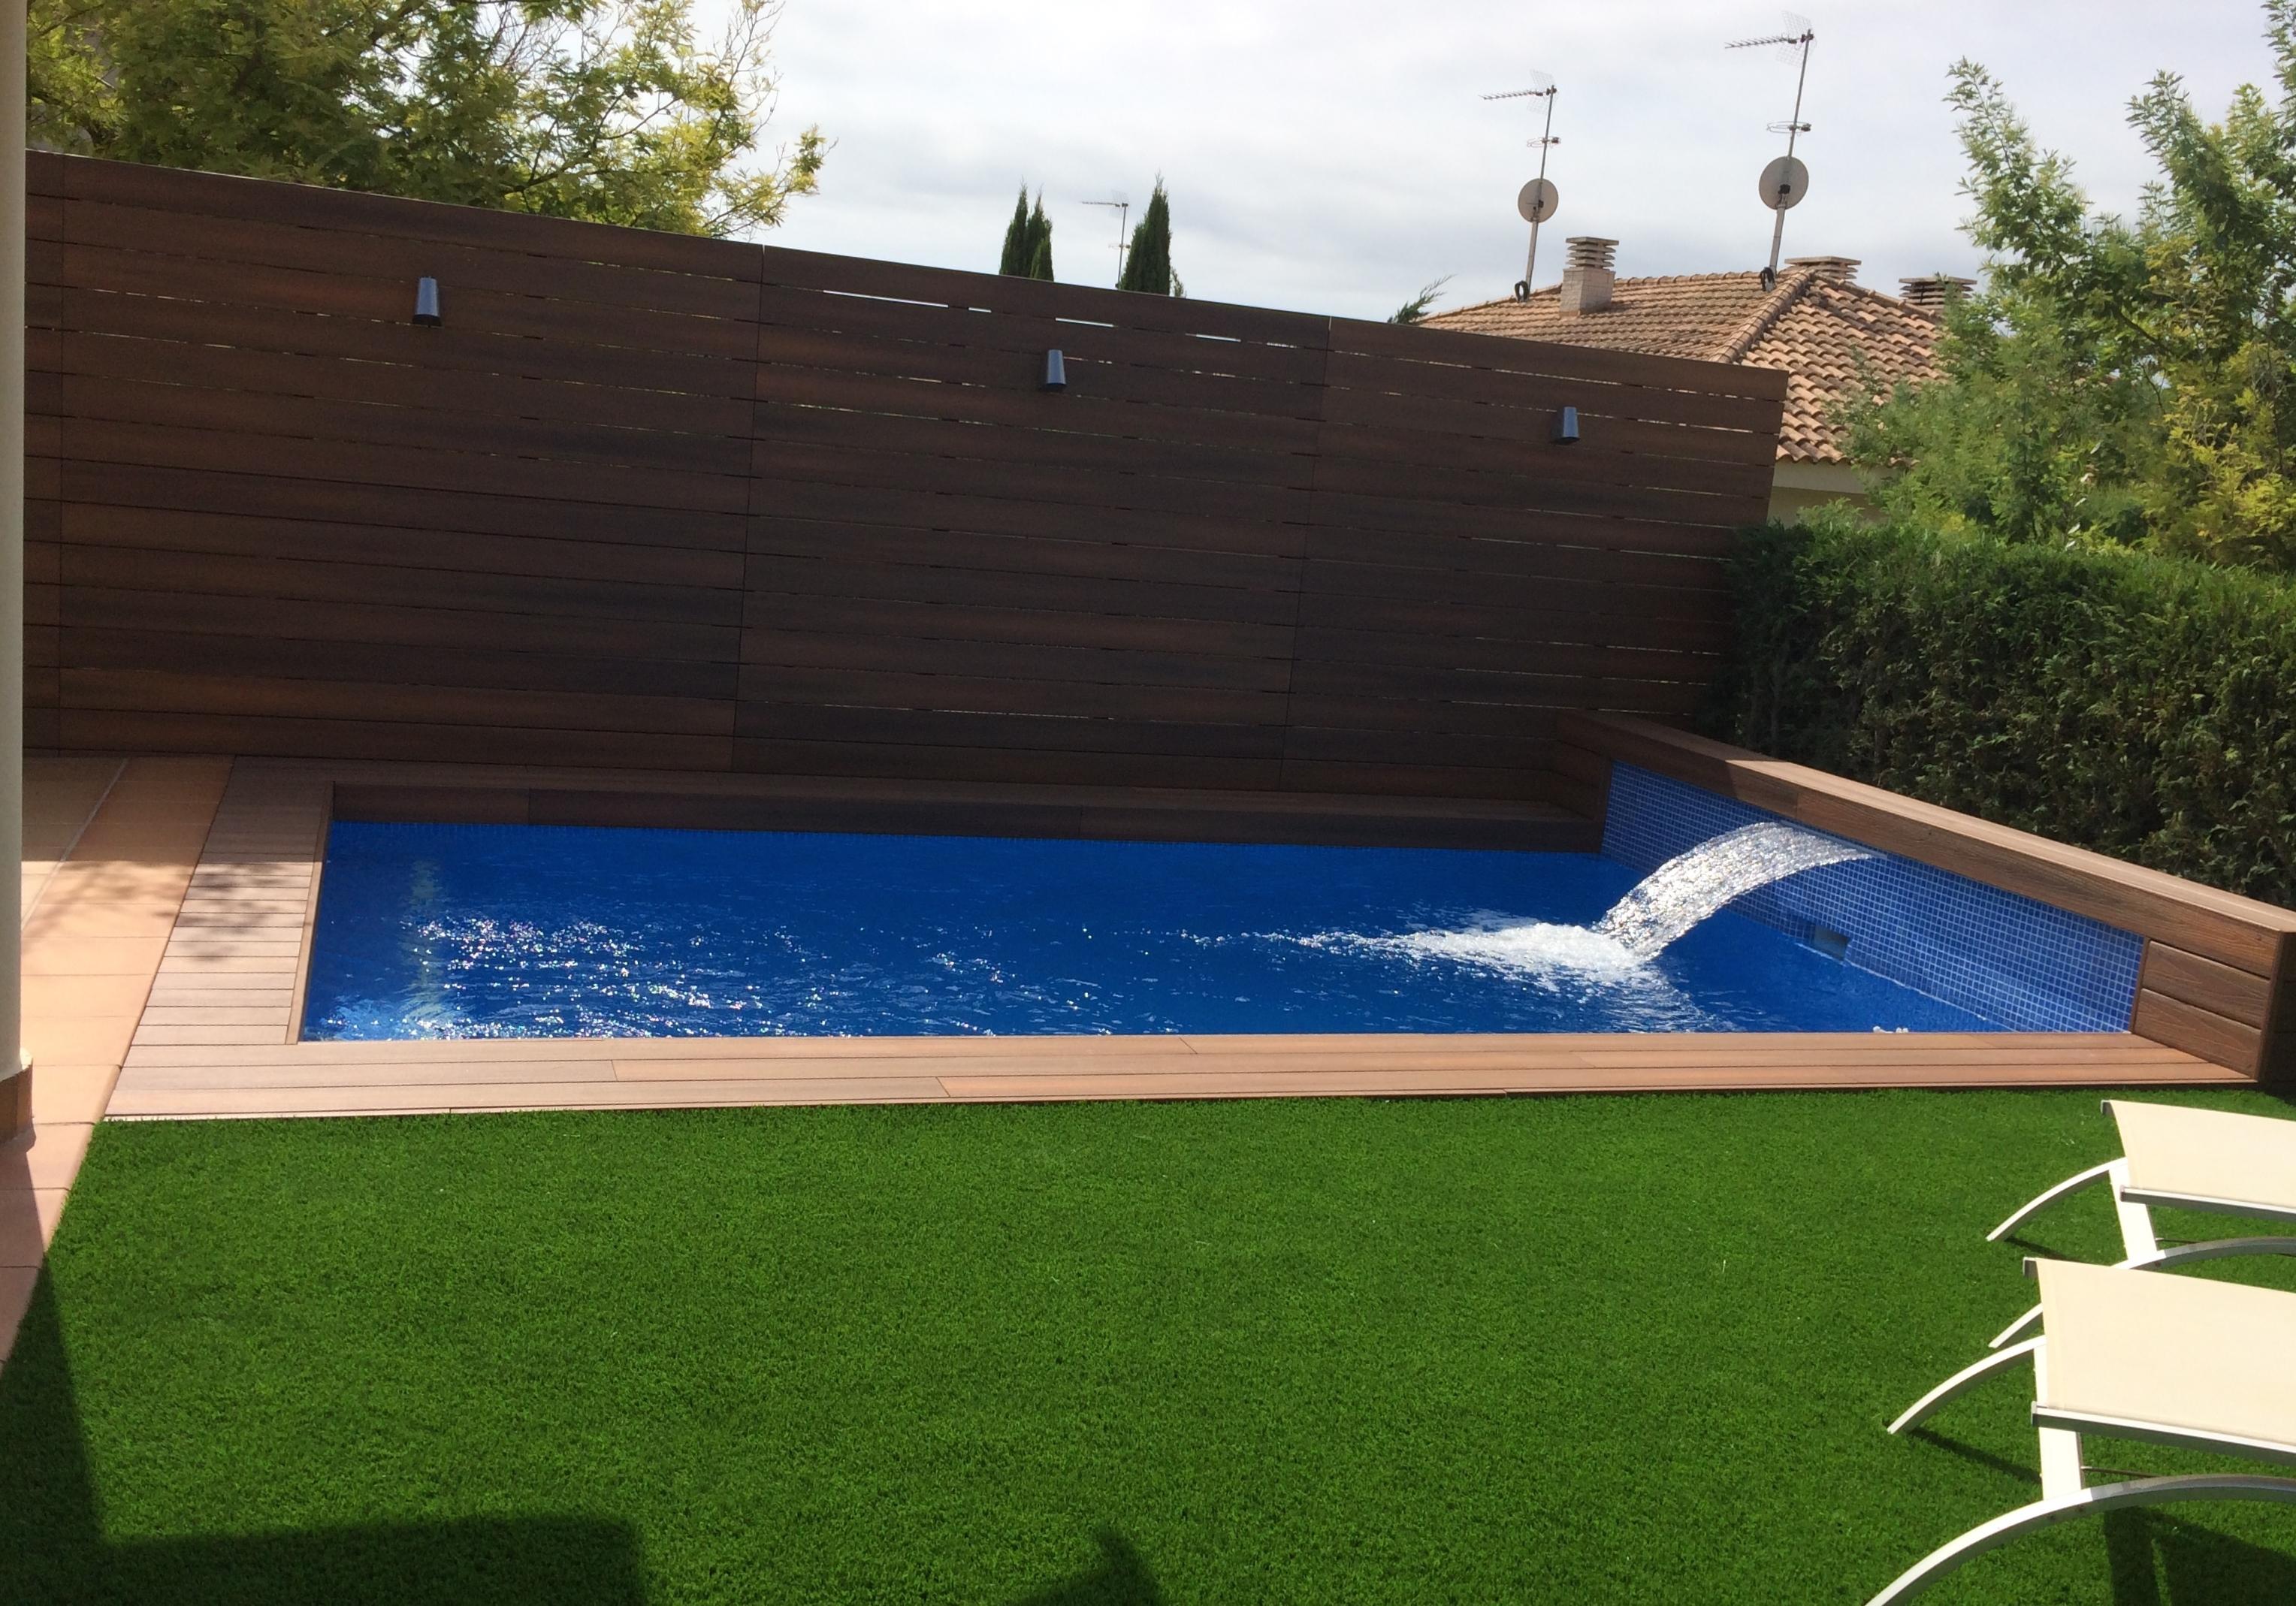 Construcci n de piscinas piscinas aop for Ver piscinas de obra